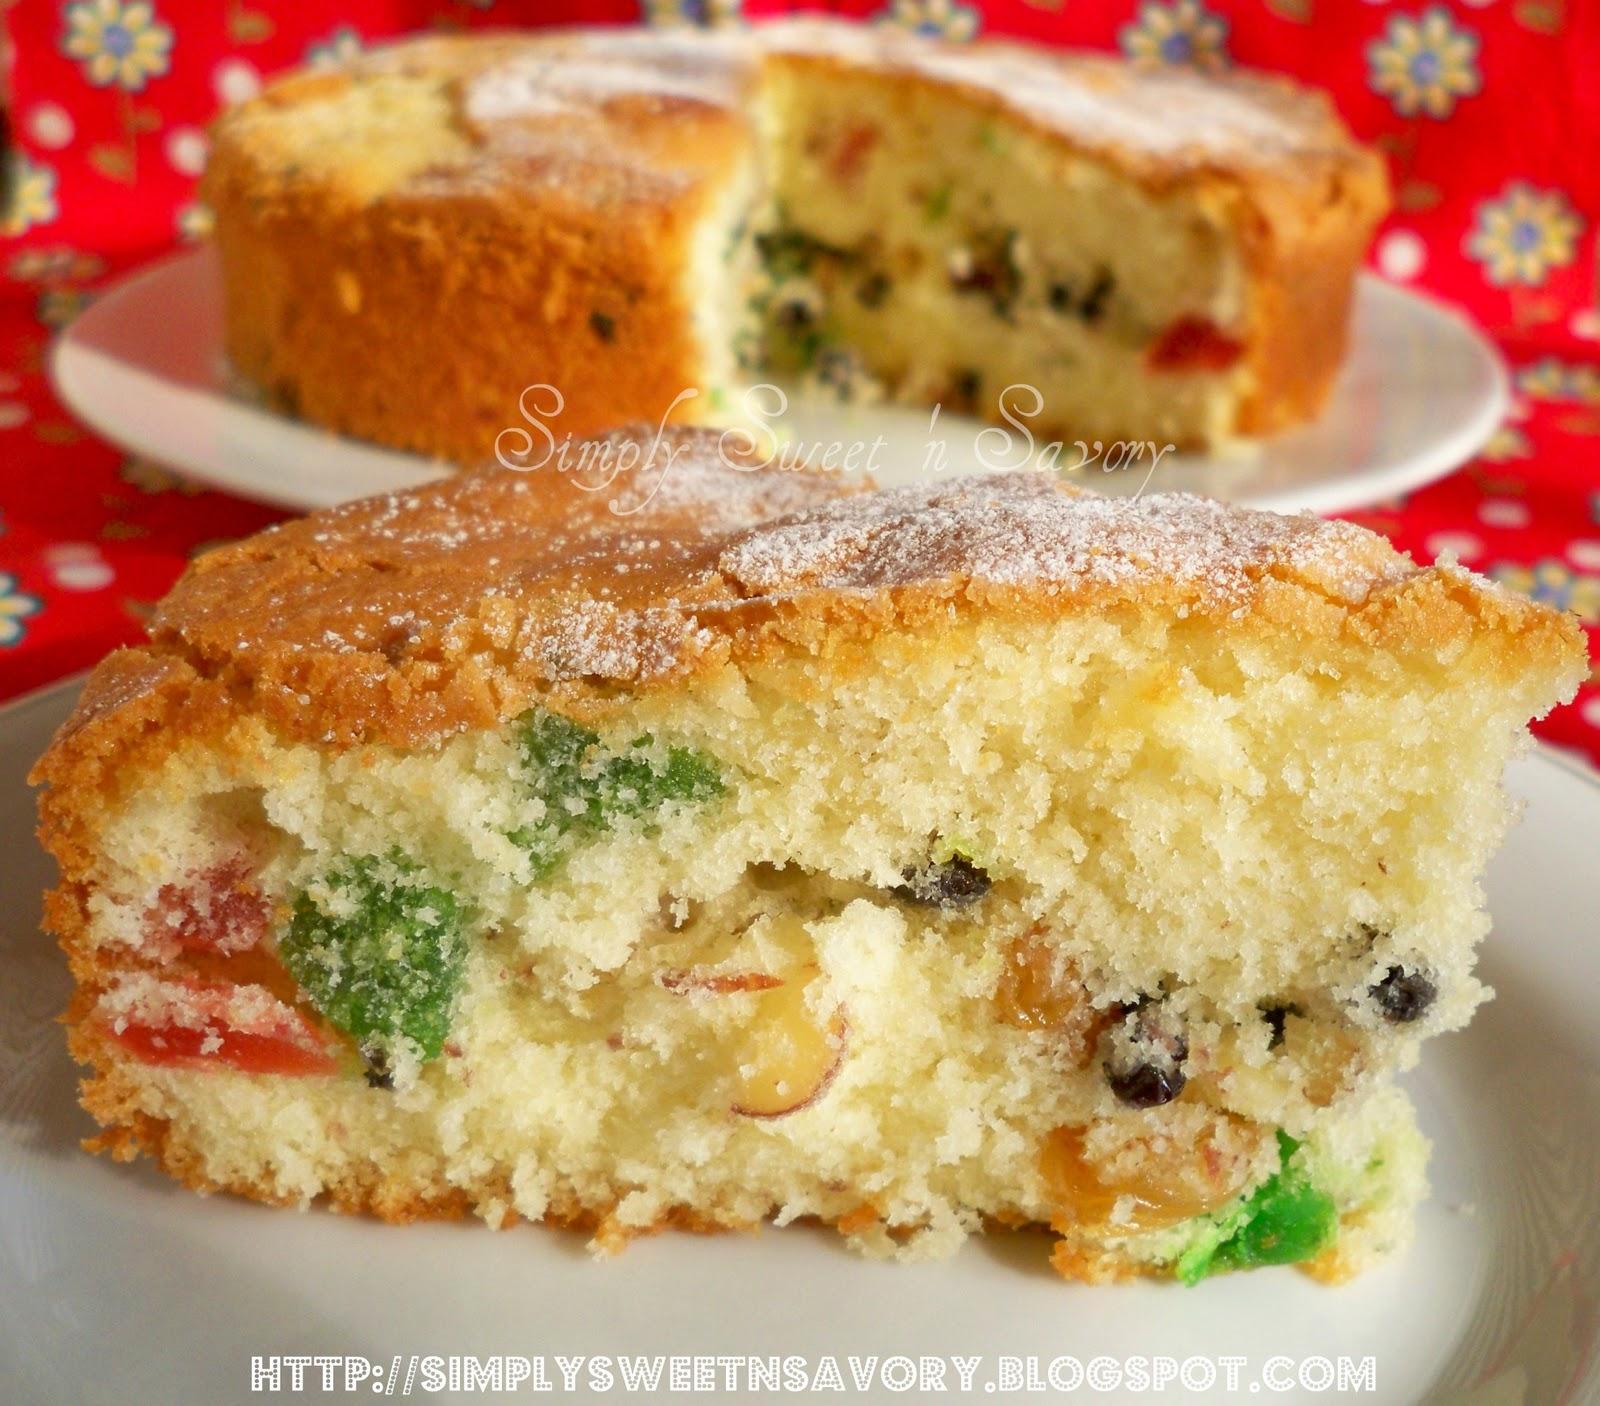 Simply Sweet 'n Savory: Light Fruit Cake